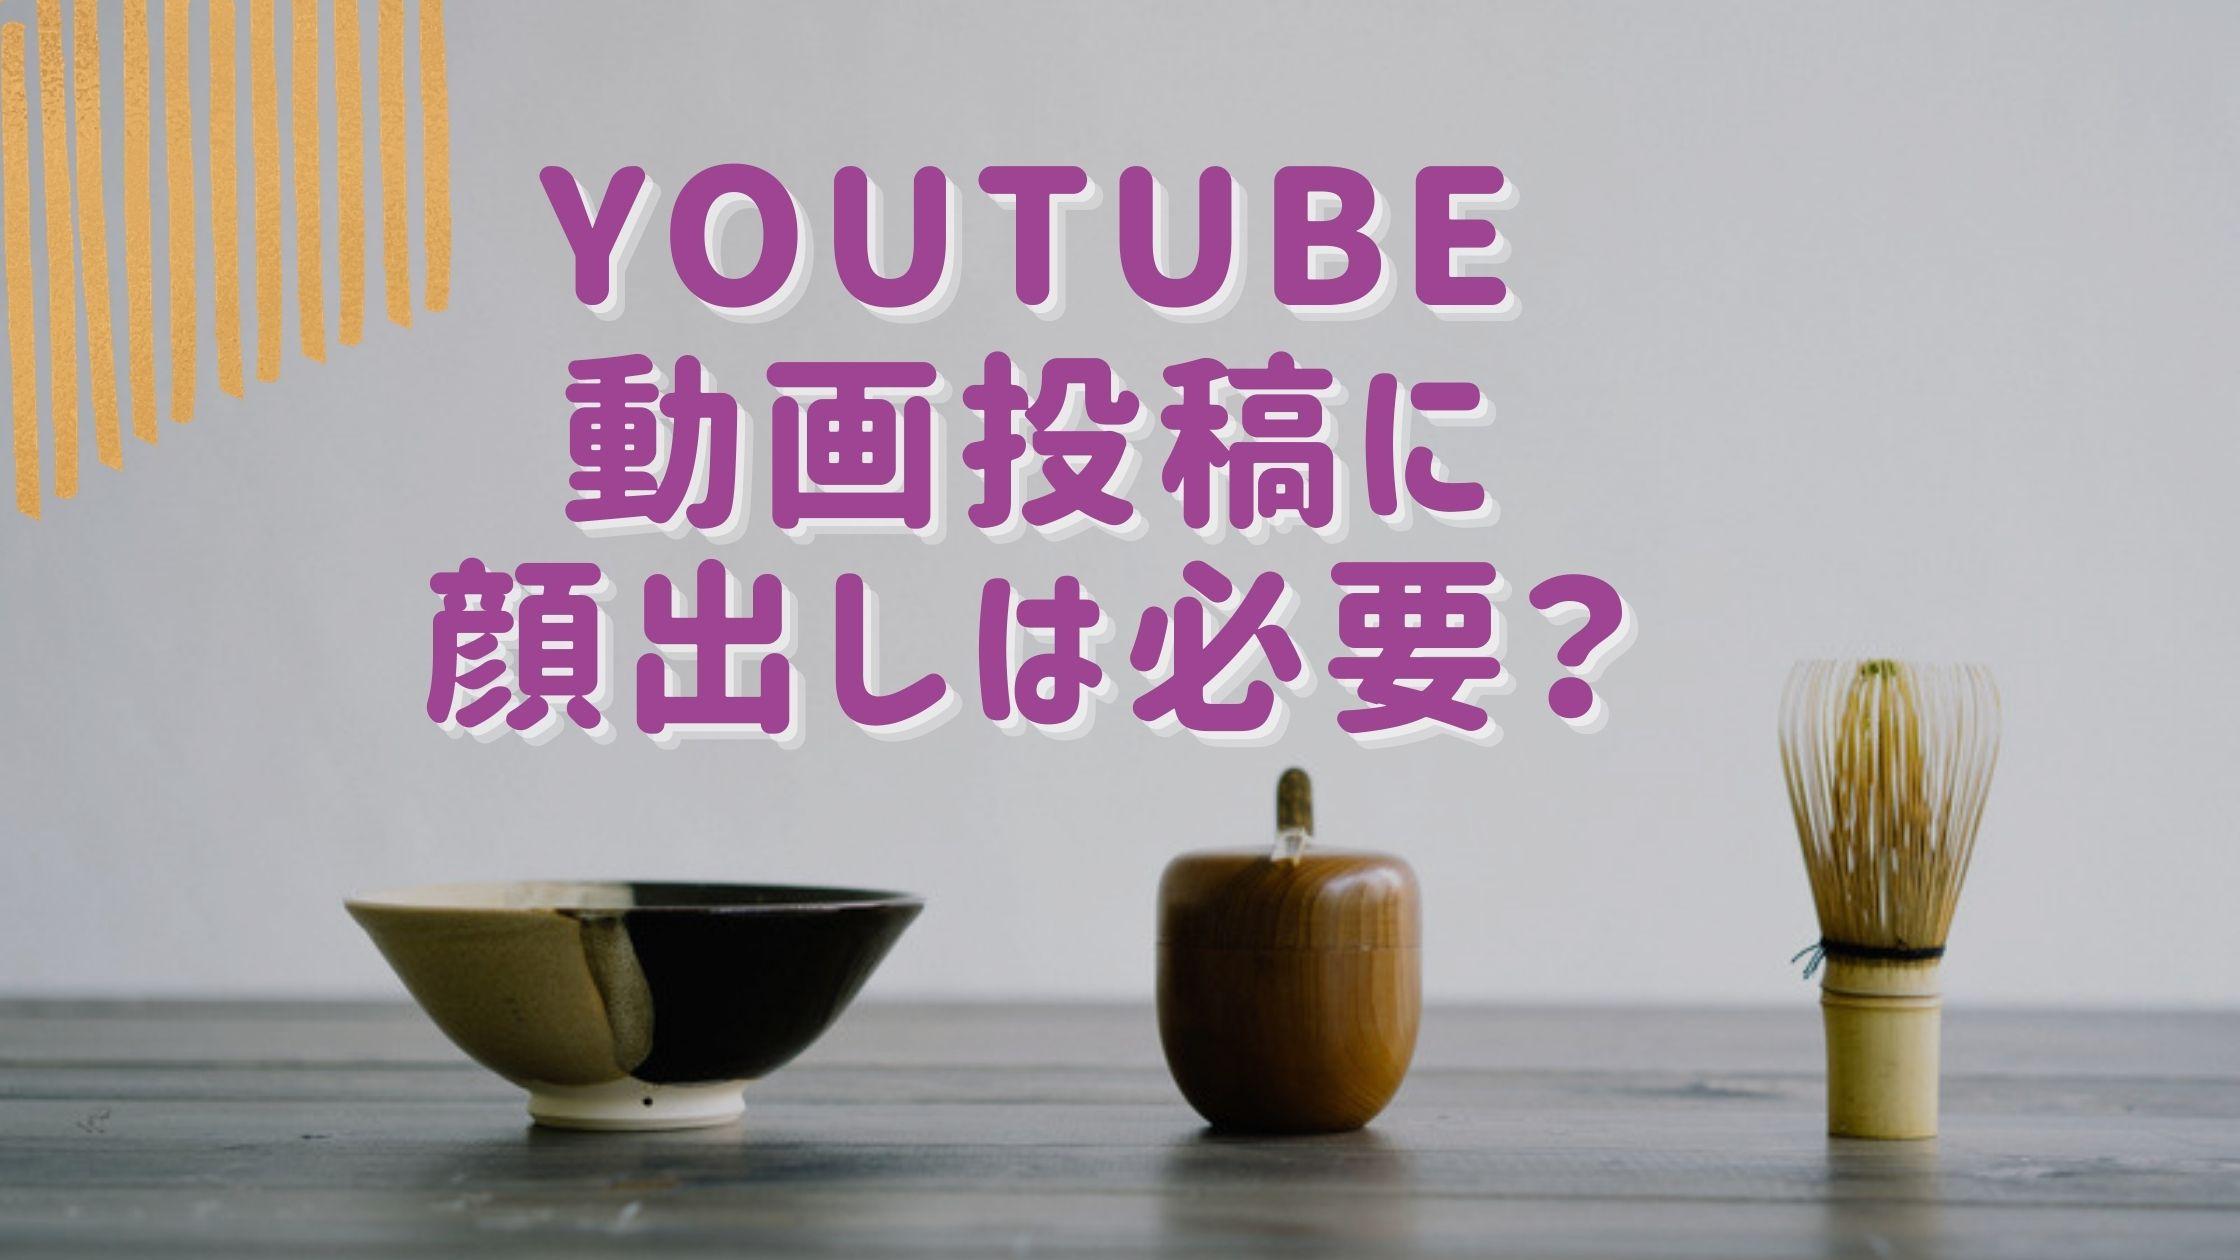 YouTube視聴者層 どの年代がいいの?-2